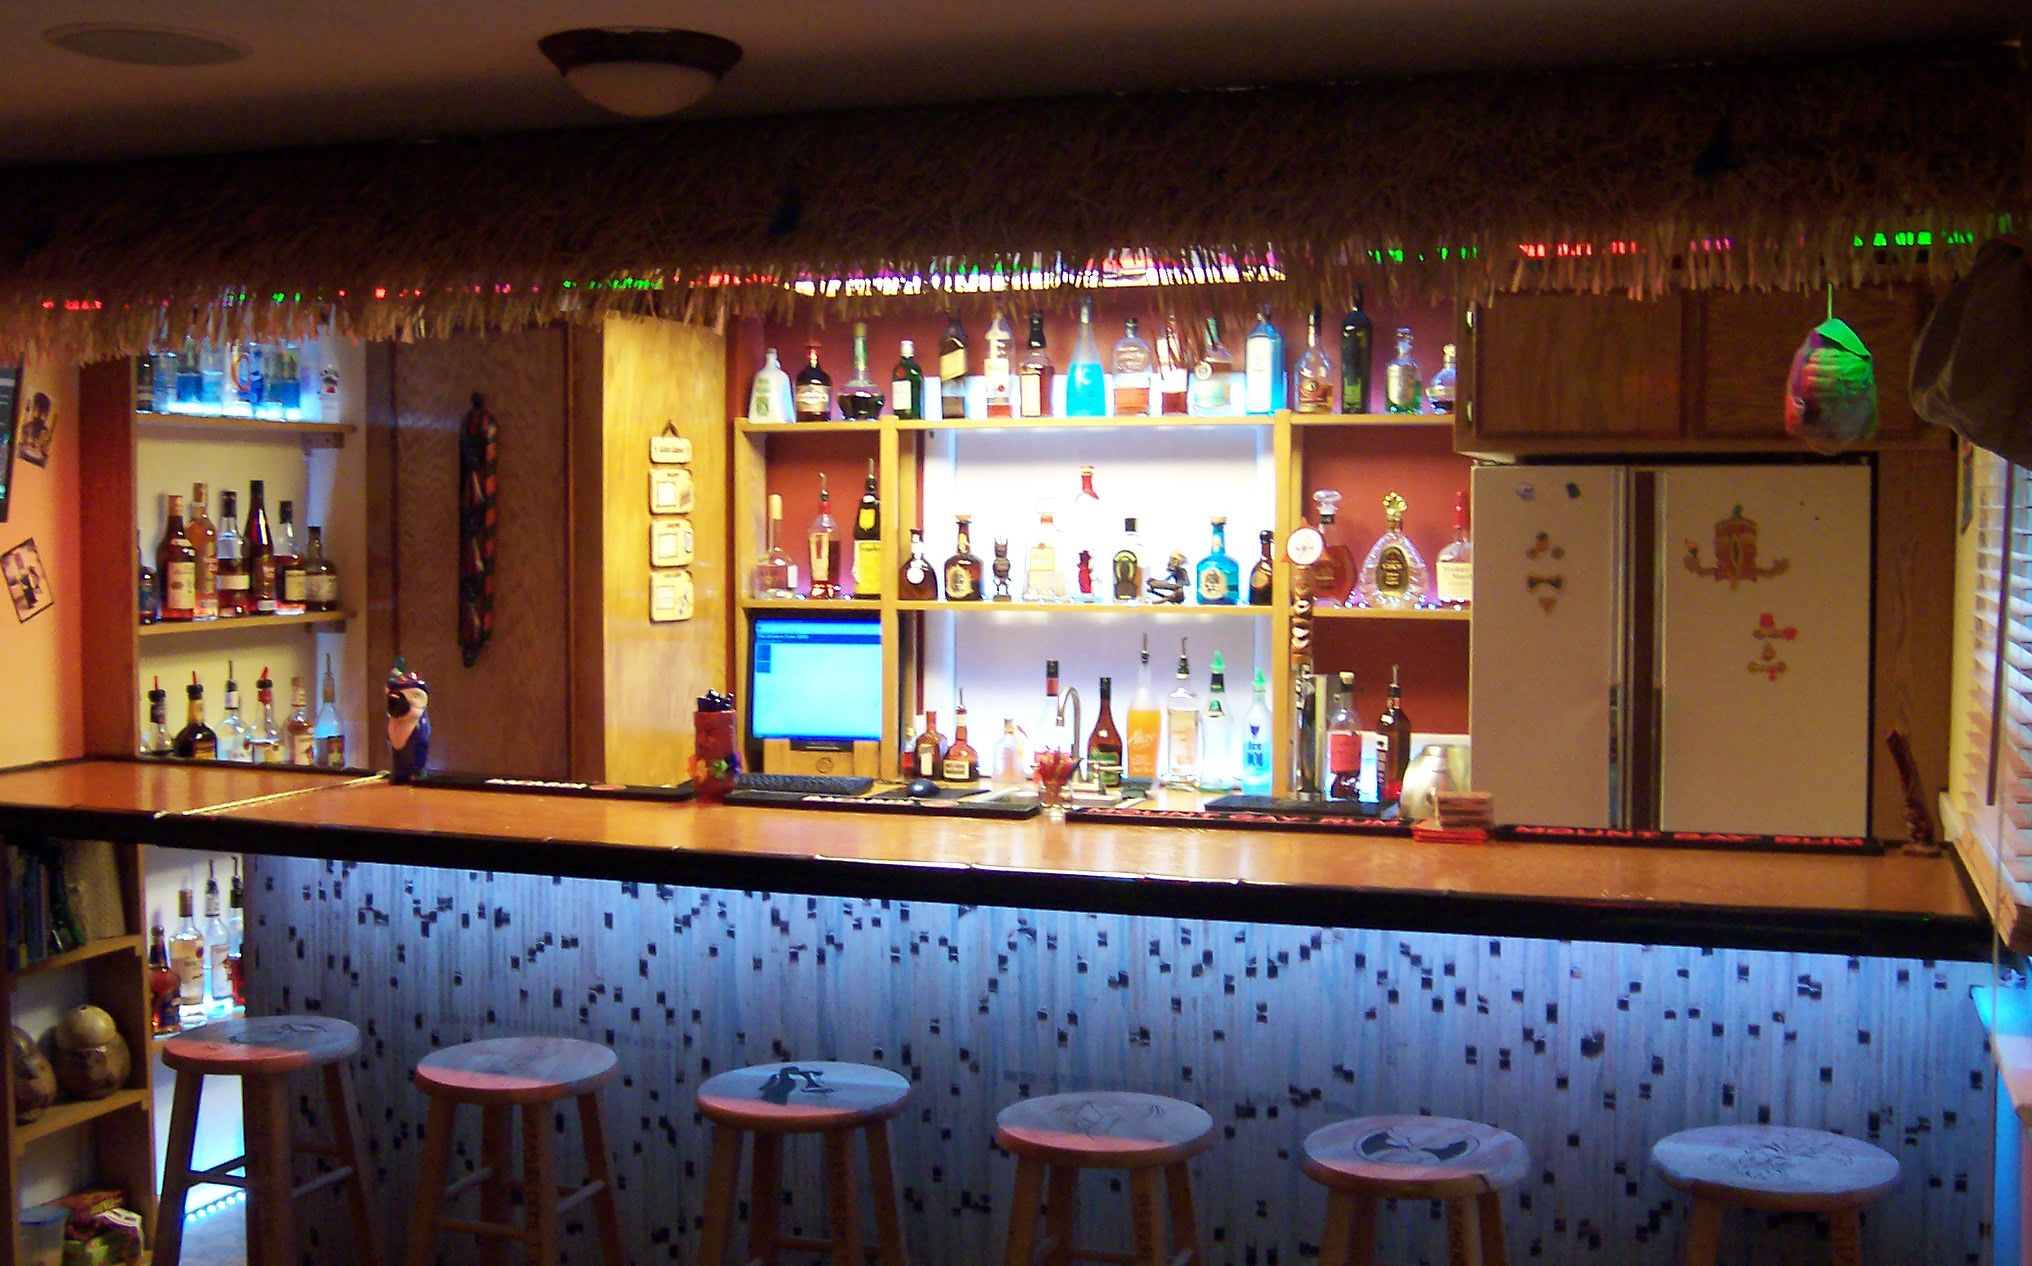 Tiki Bar 3.0 - The Pleasure Dome Tiki Bar